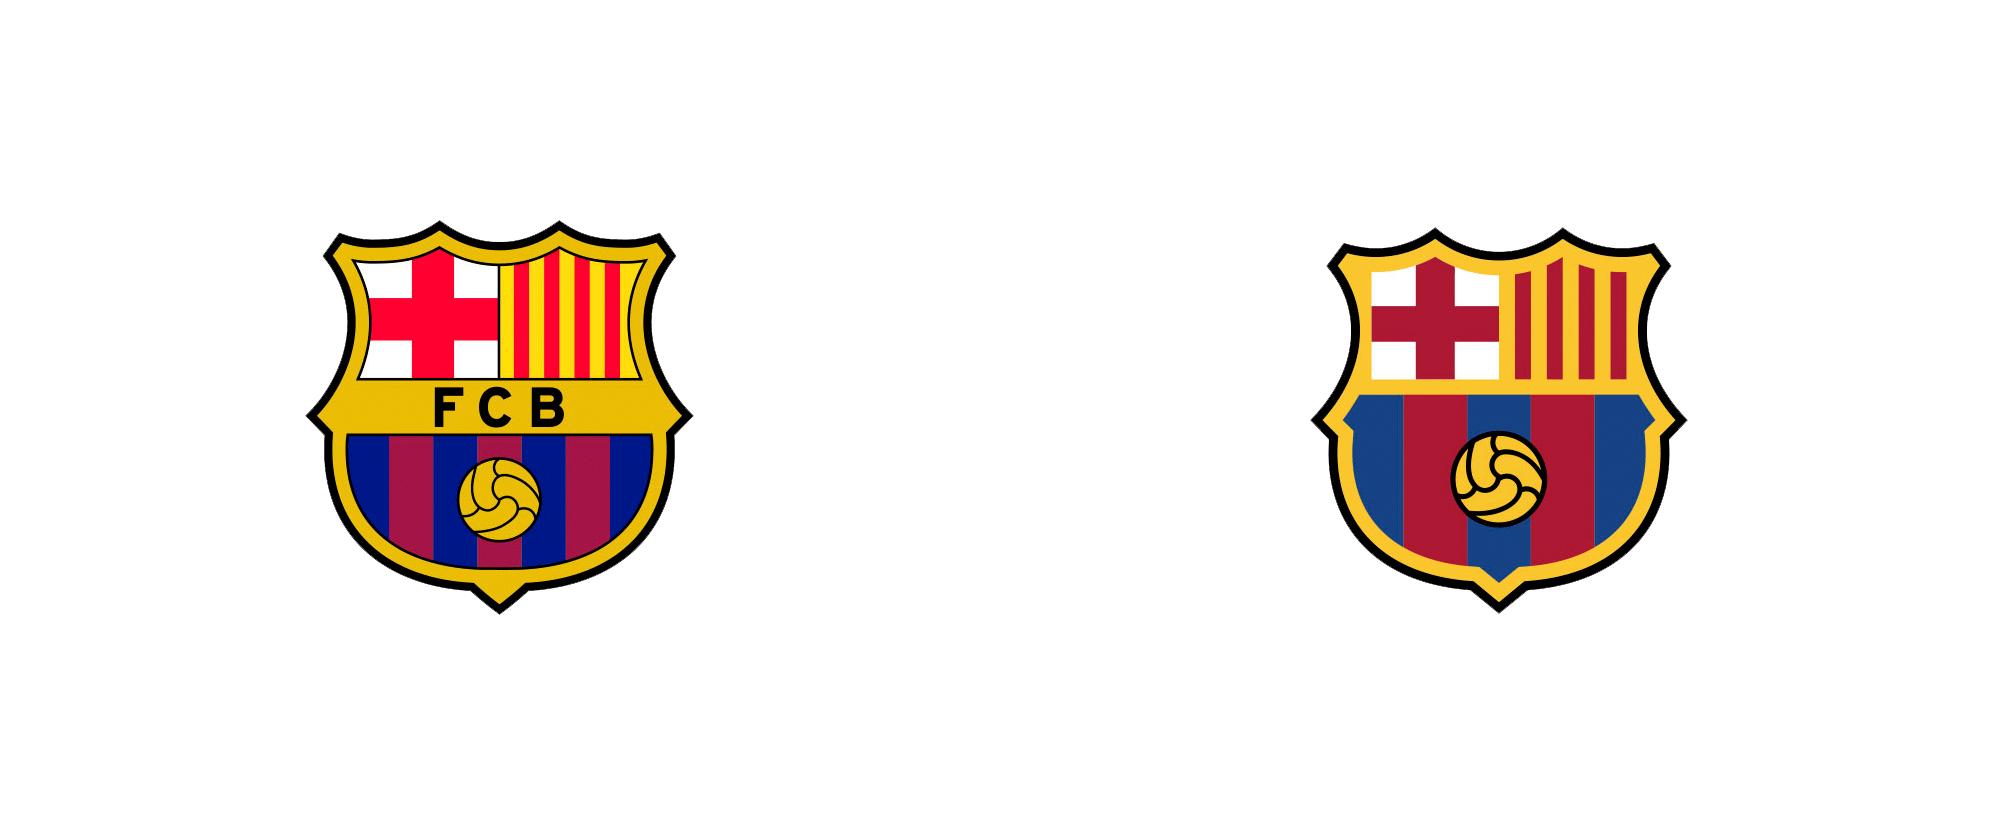 brand new new crest